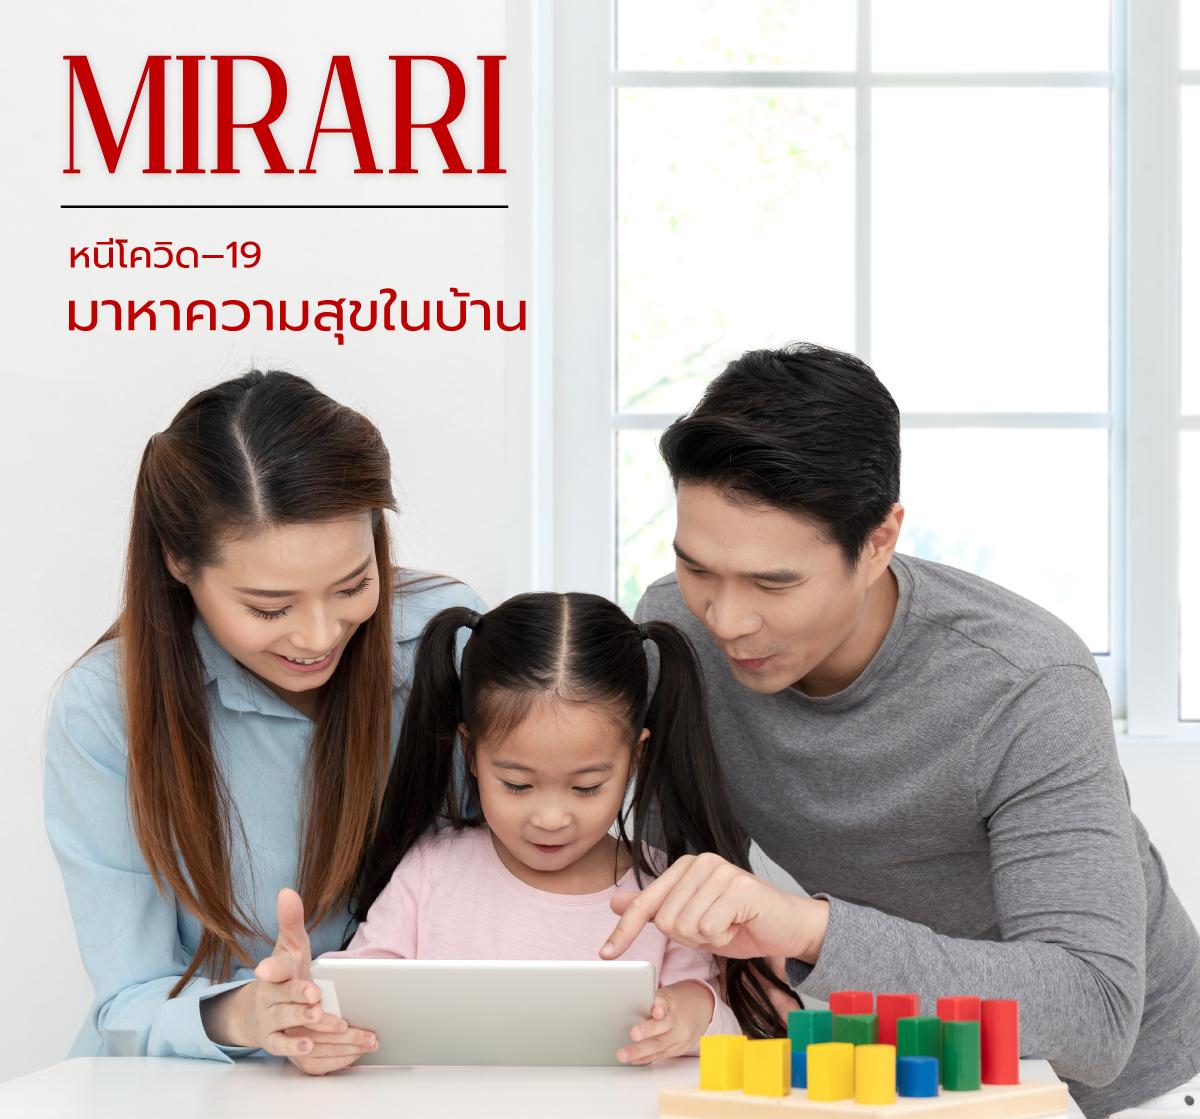 Mirari_mobile_banner03eedit